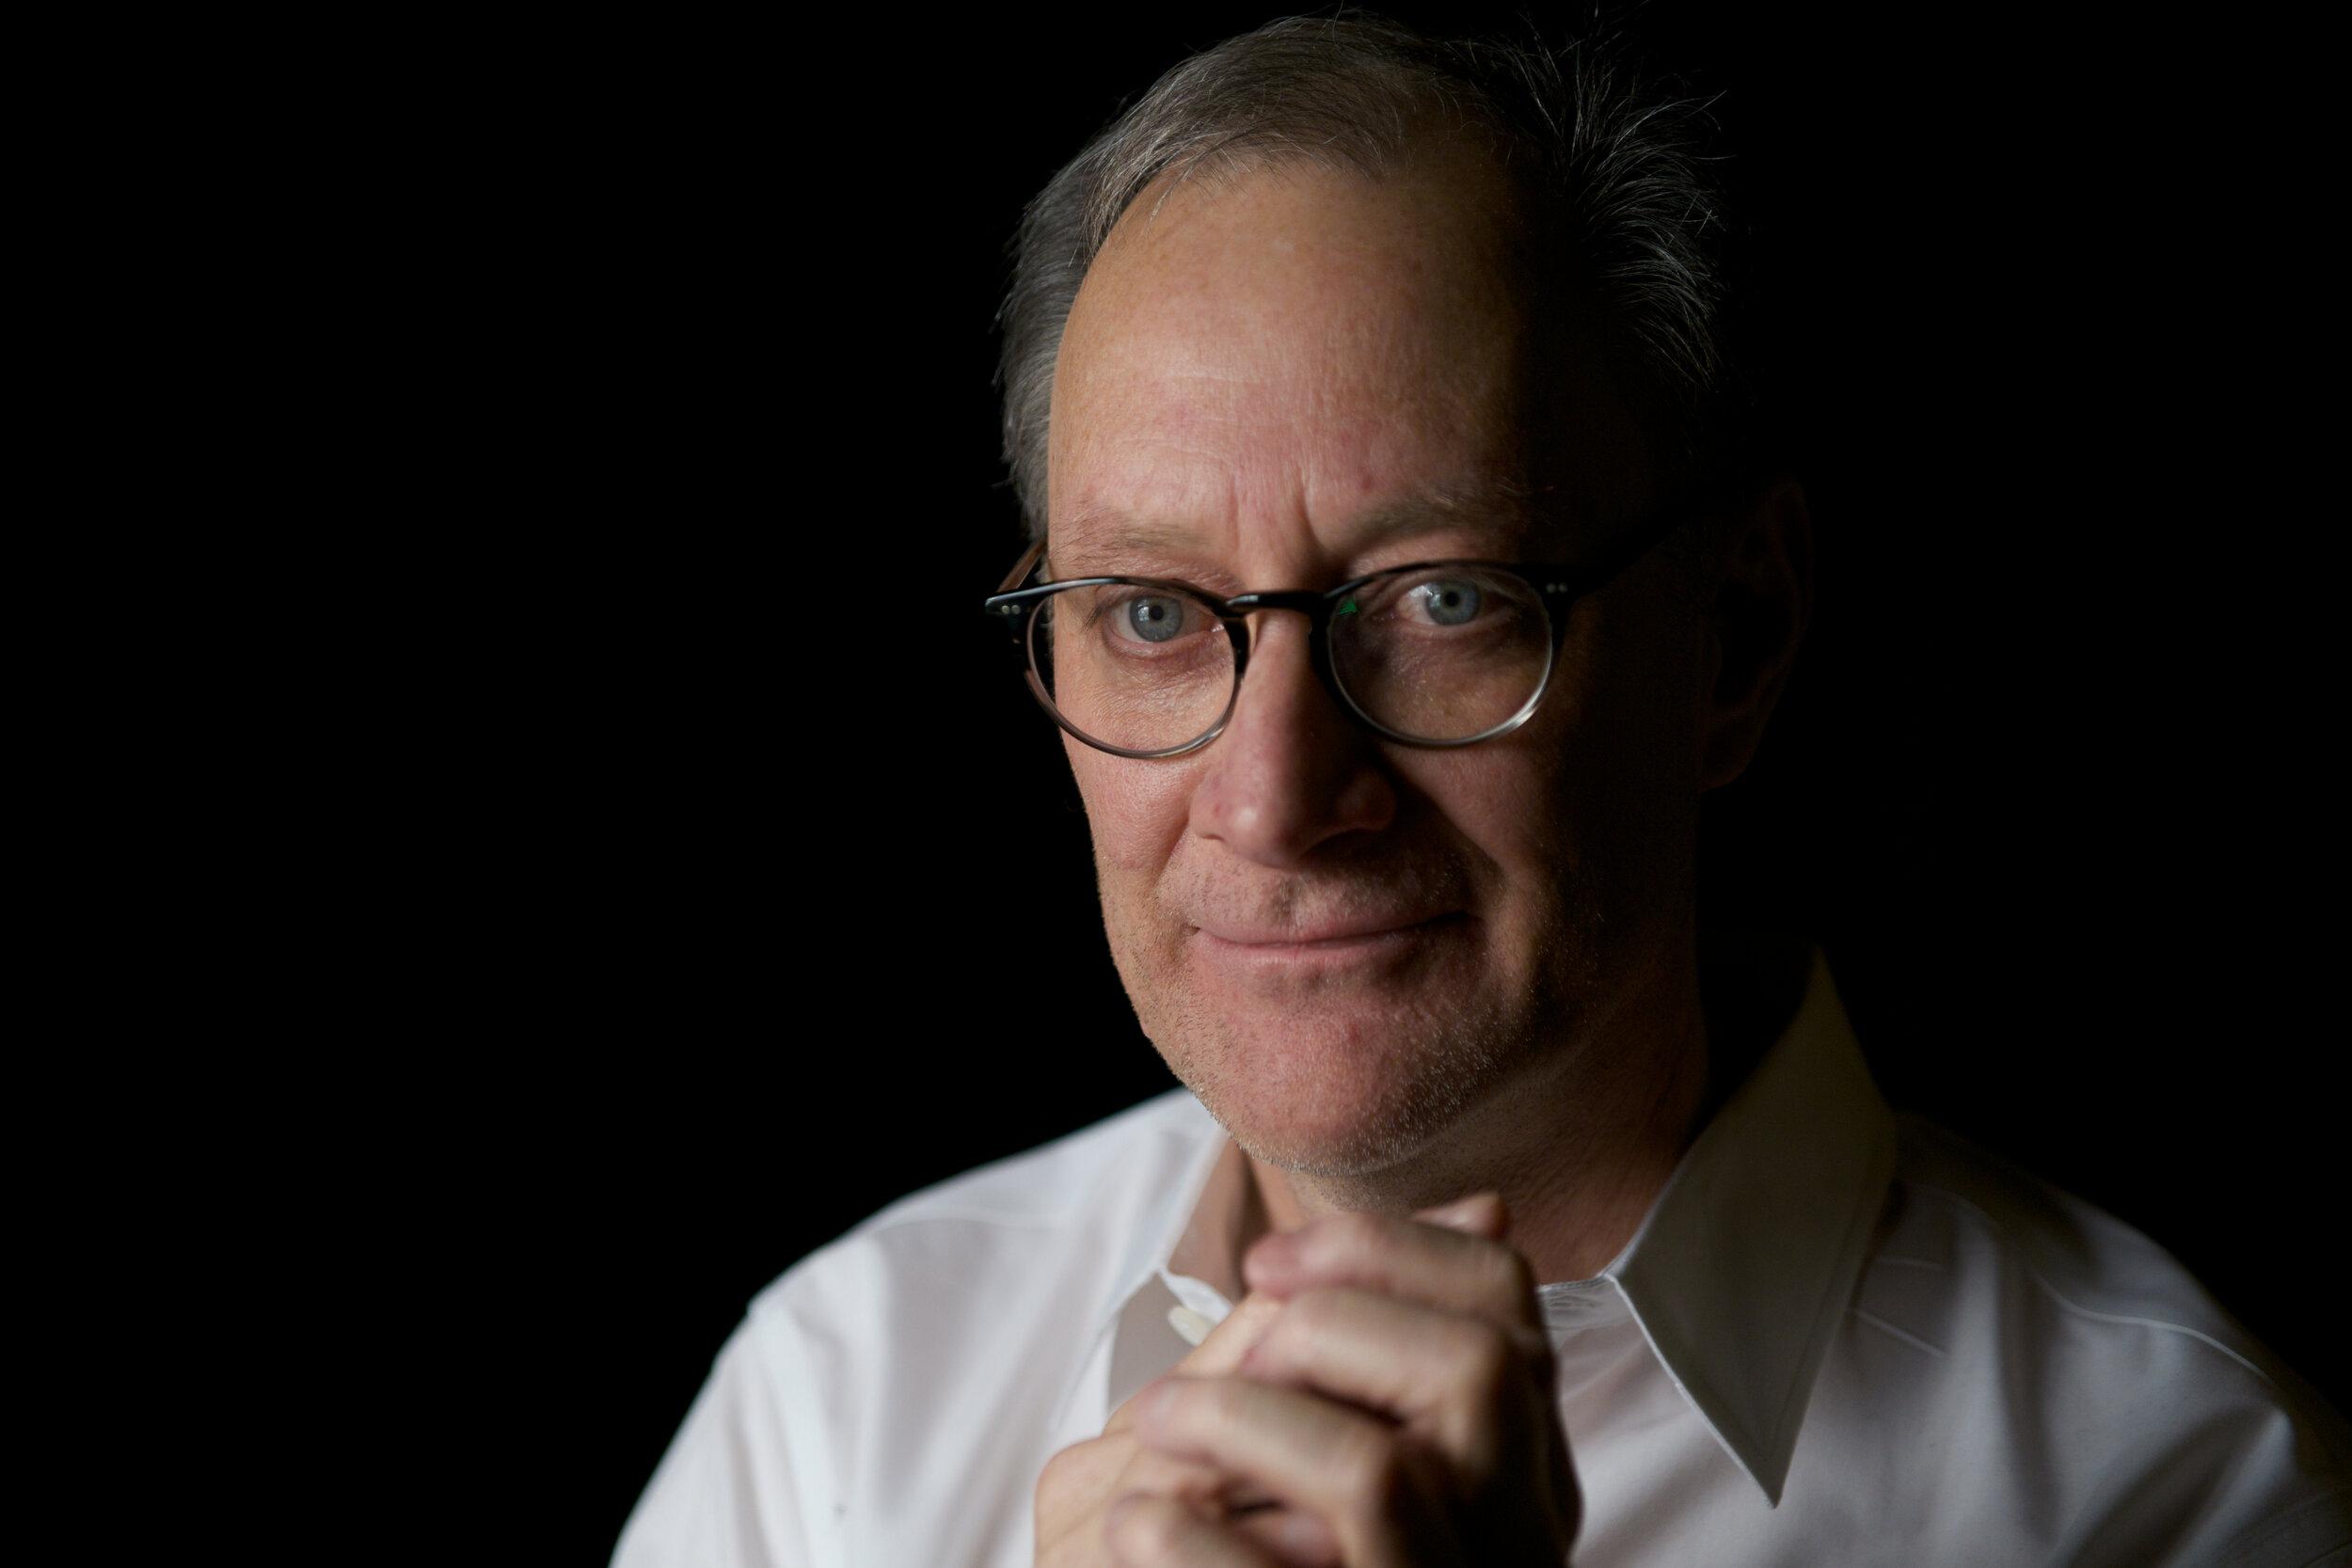 2021 Viola Concerto Commission Consortium - Douglas Knehans, ComposerMichael Hall, Viola SoloBelow you'll find information—deadlines, instrumentation, pricing, inspiration and FAQs—about the 2021 Viola Concerto Consortium.